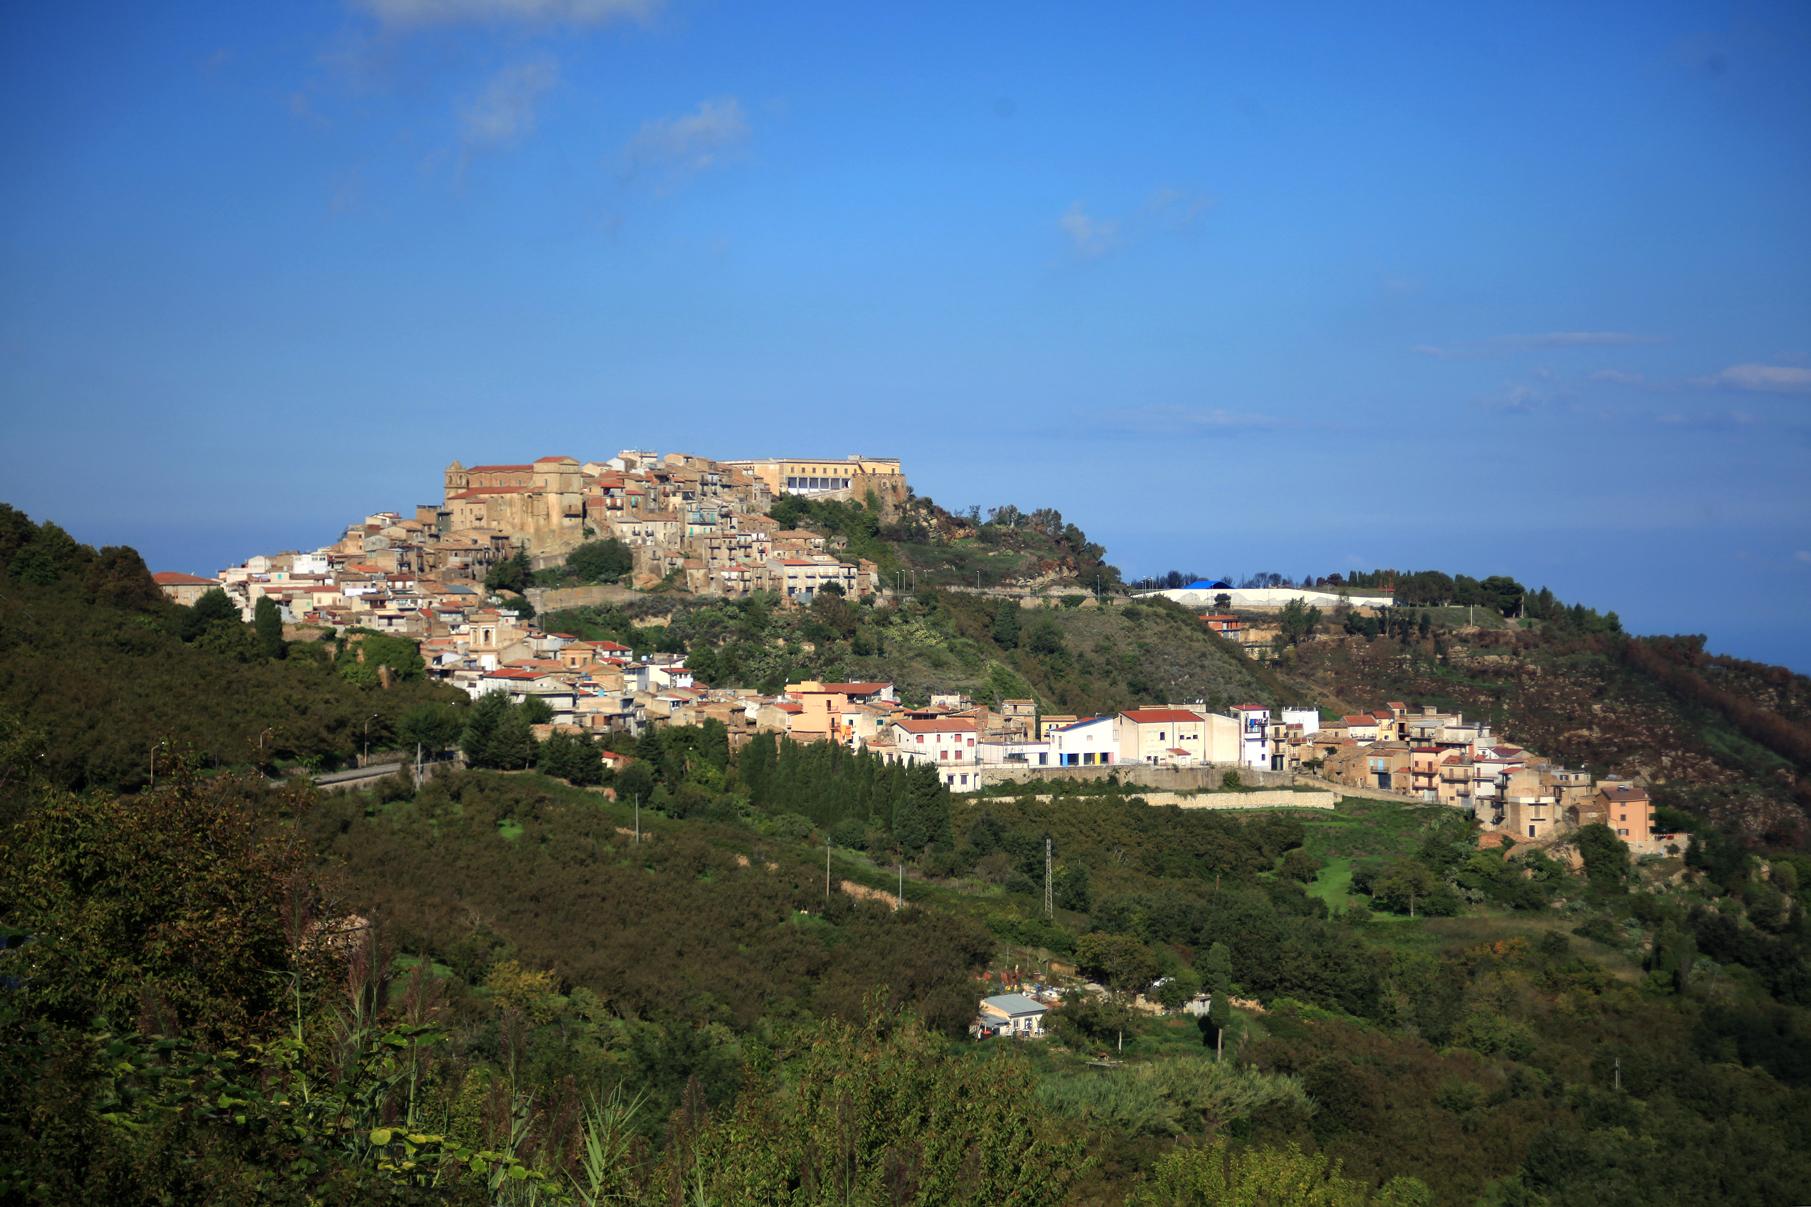 Motta d'Affermo - Sicily